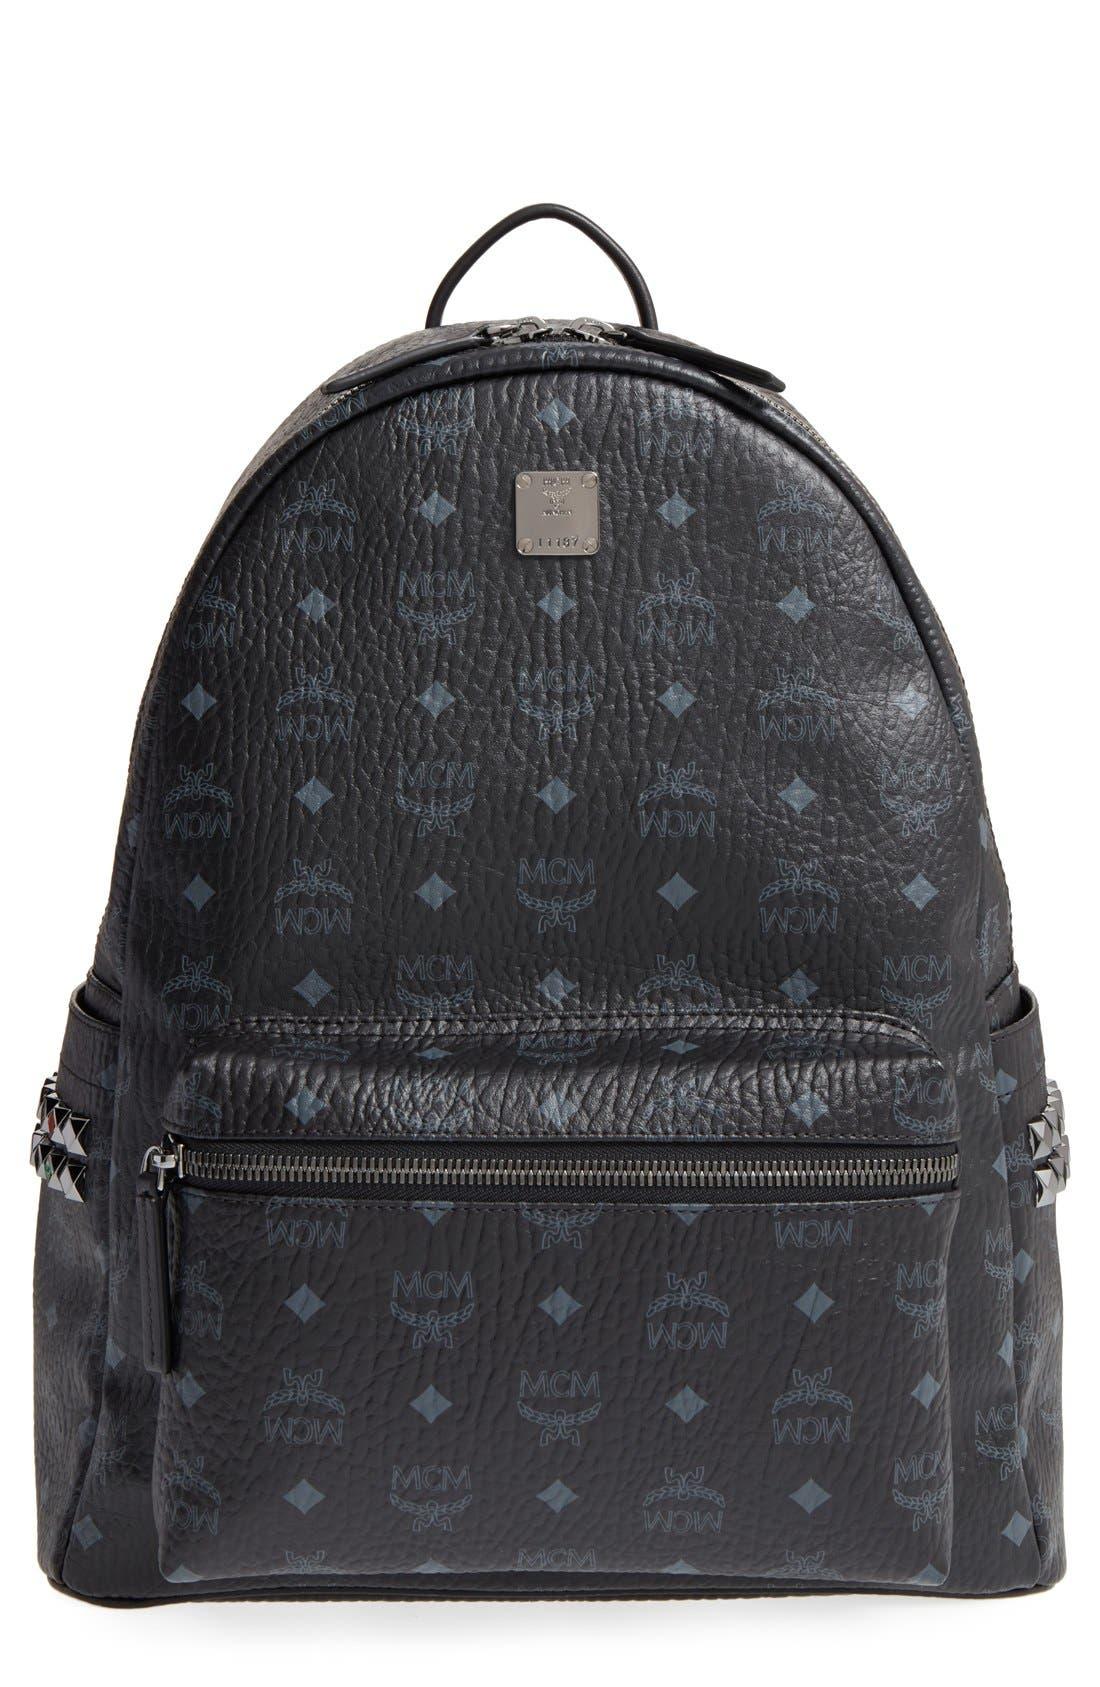 Main Image - MCM Medium Stark Coated Canvas Backpack